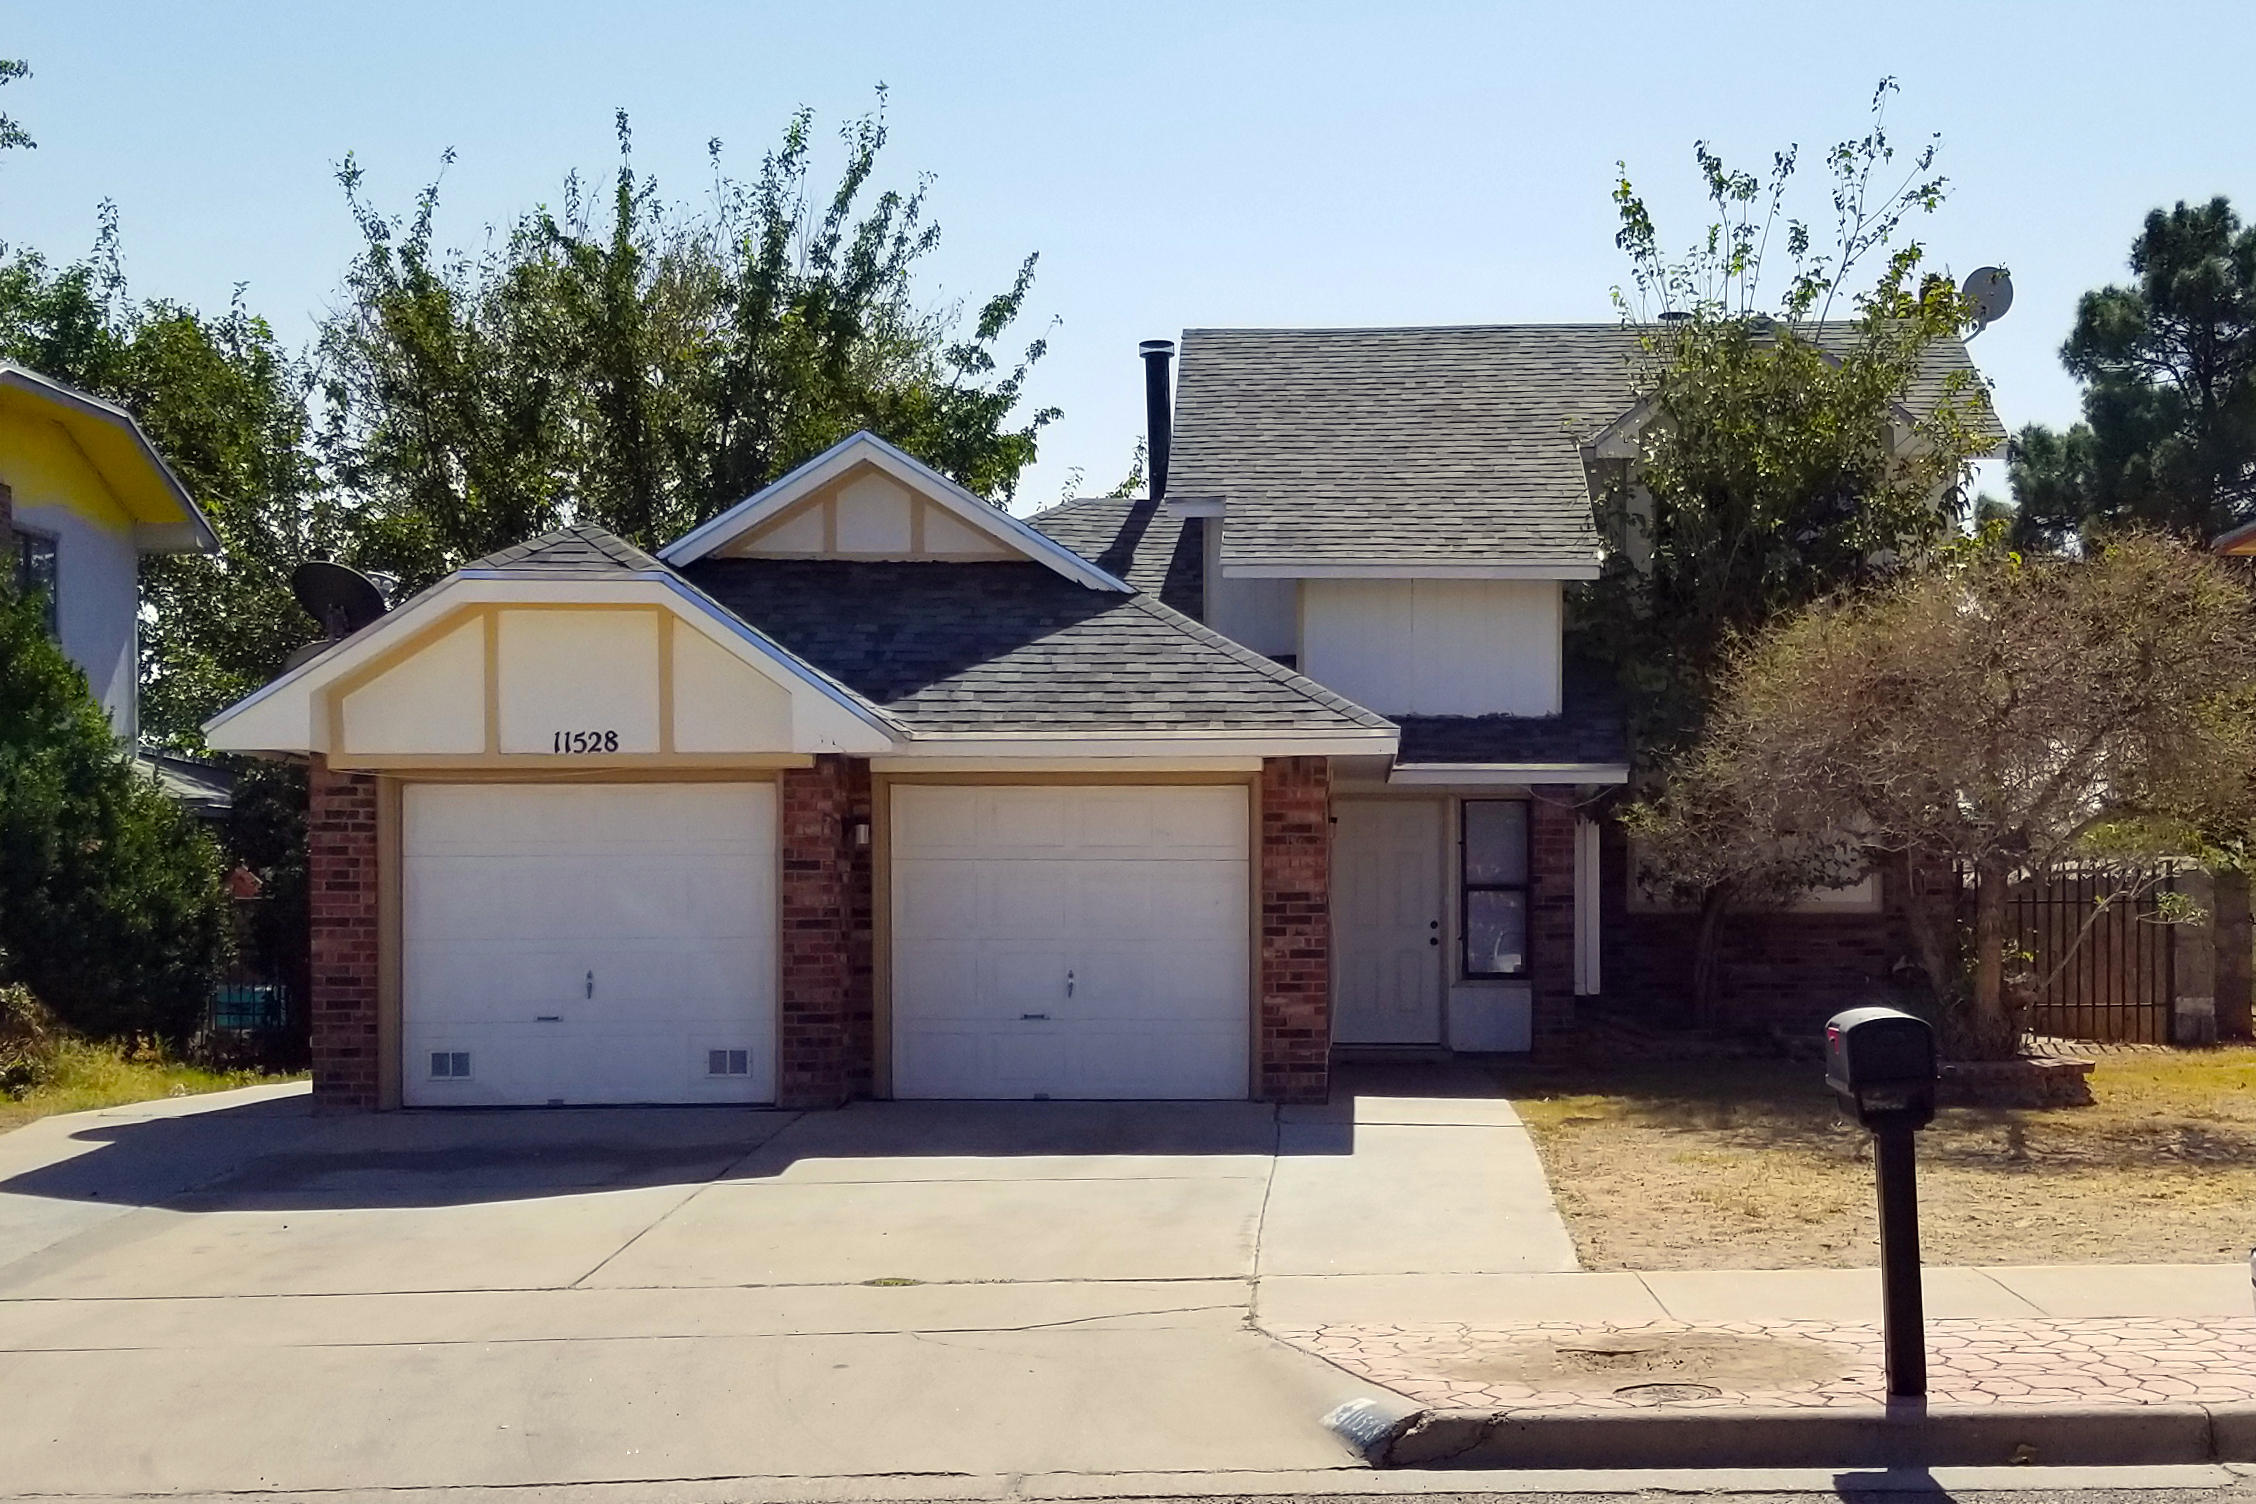 11528 JERRY LEWIS Way, El Paso, Texas 79936, 3 Bedrooms Bedrooms, ,2 BathroomsBathrooms,Residential Rental,For Rent,JERRY LEWIS,835877